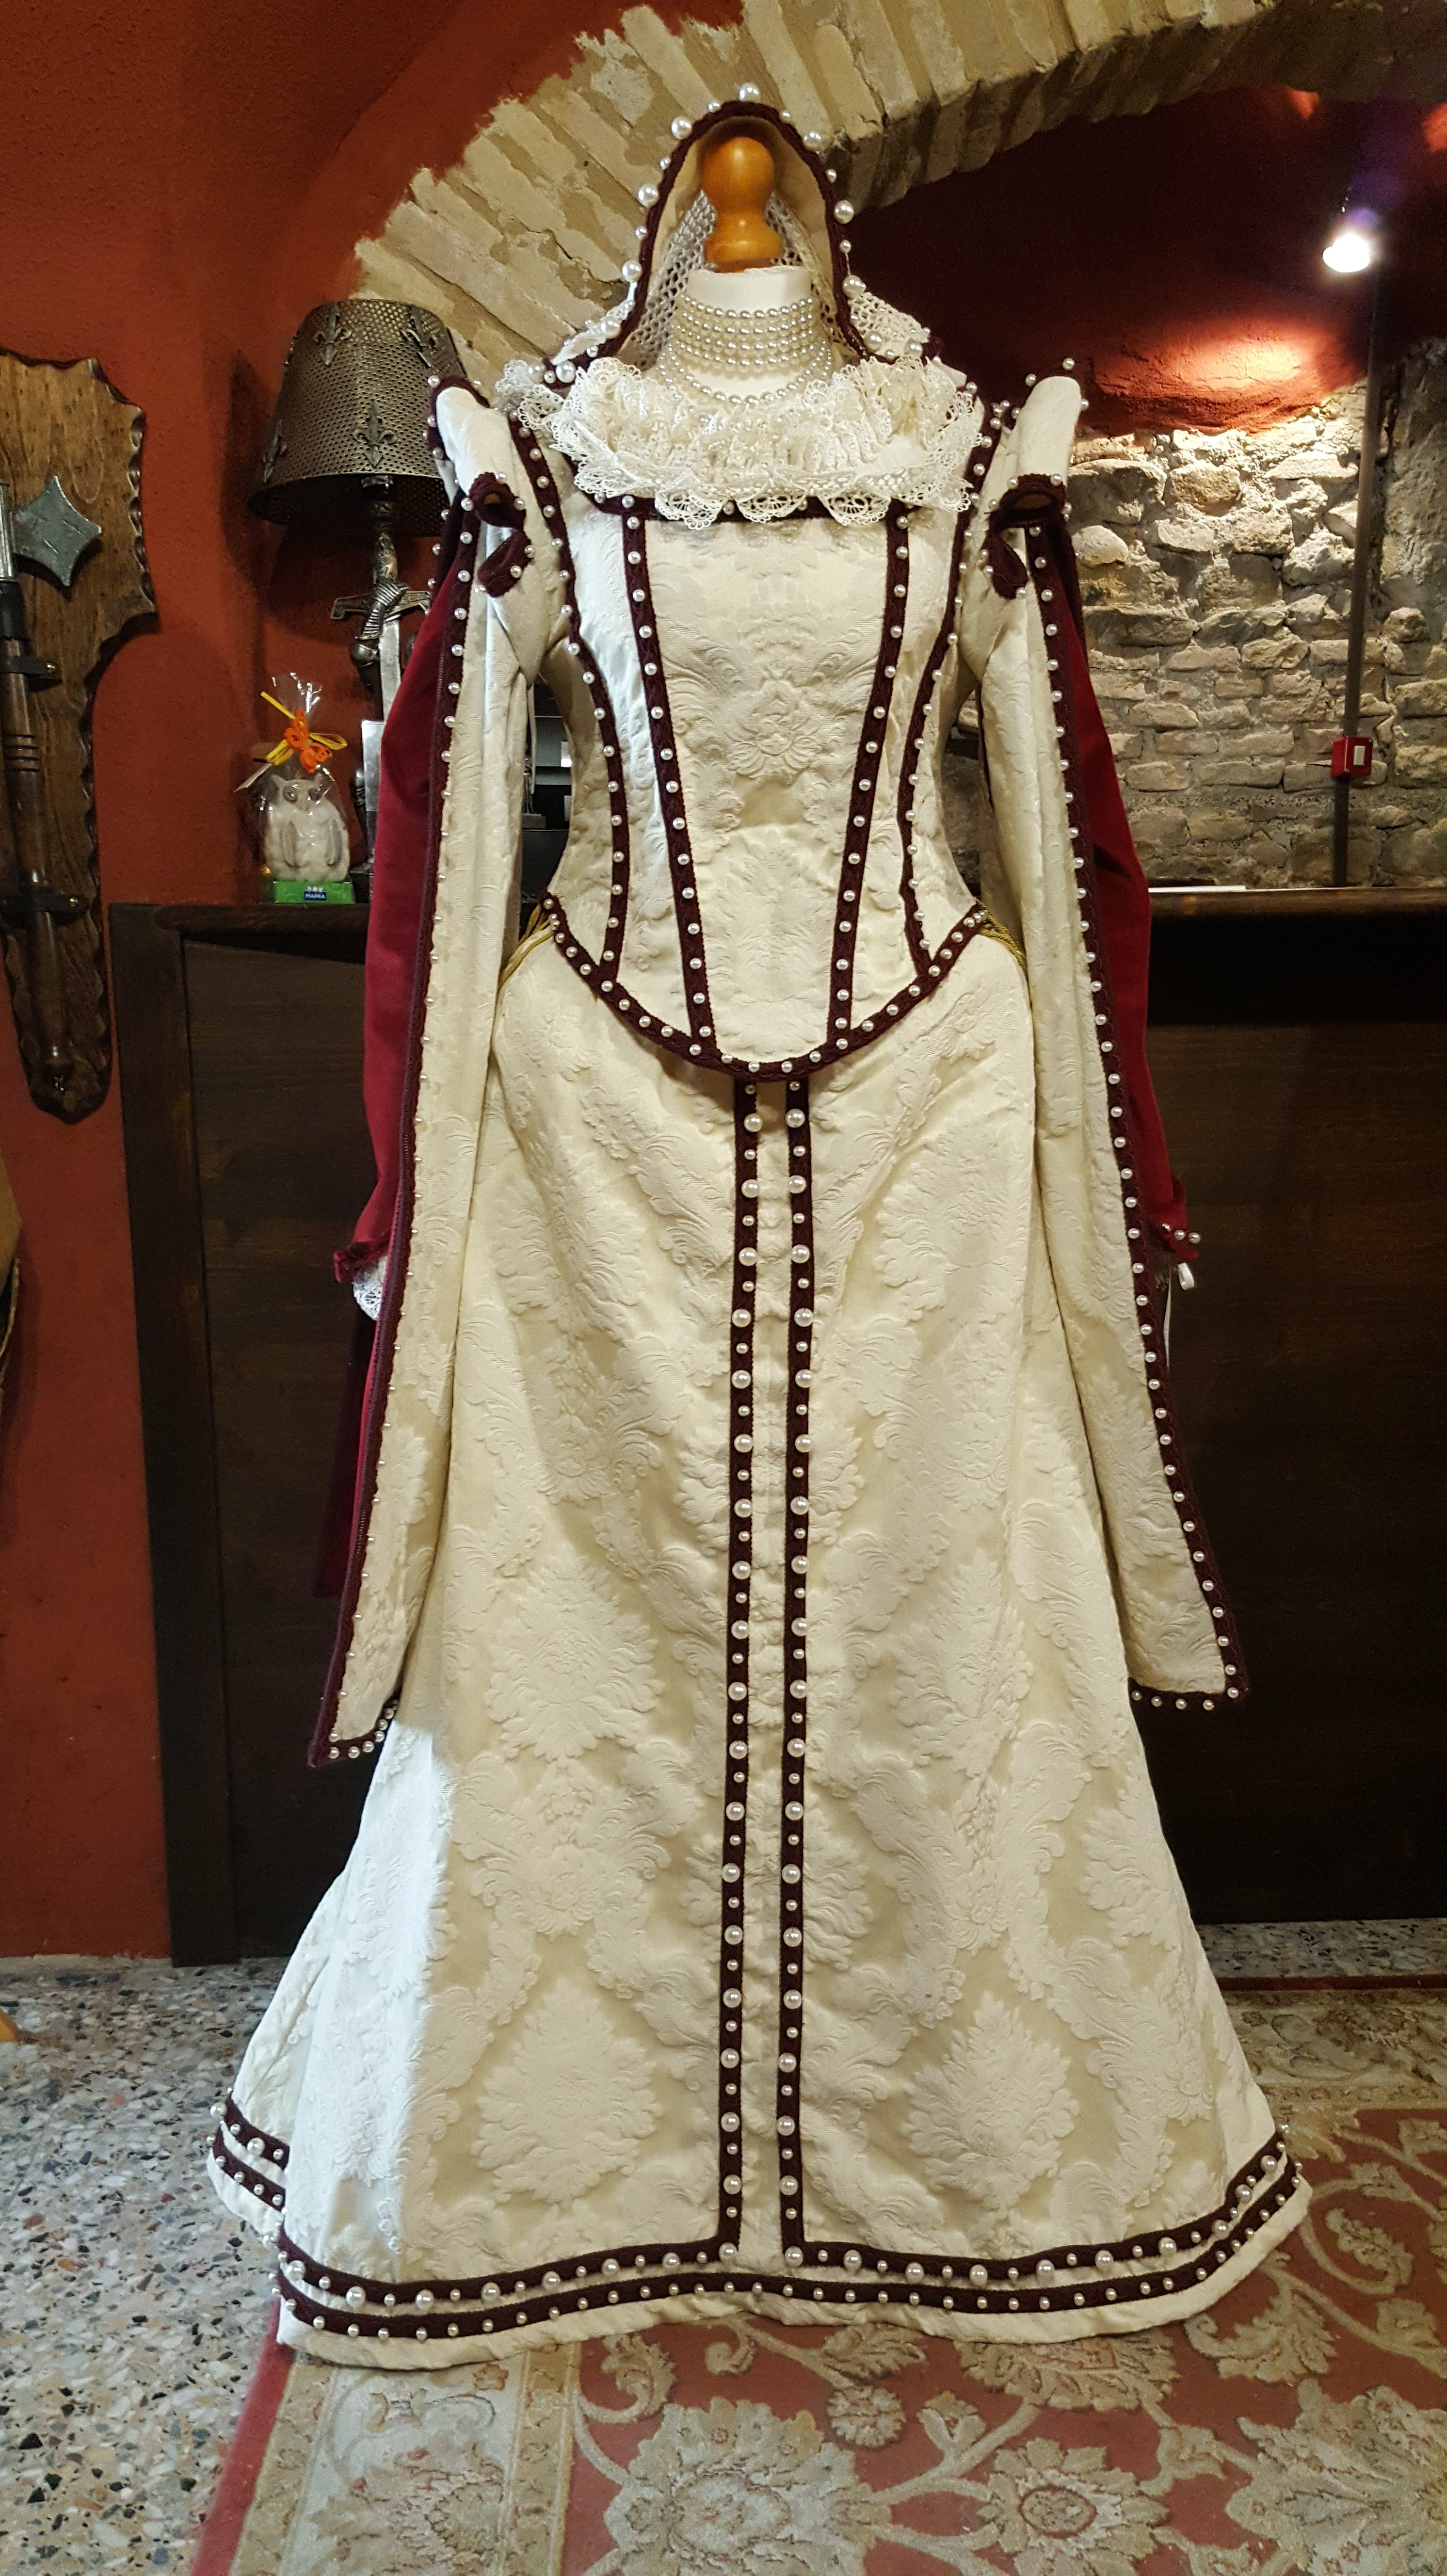 Veste rinascimentale da donna color avorio e  rosso